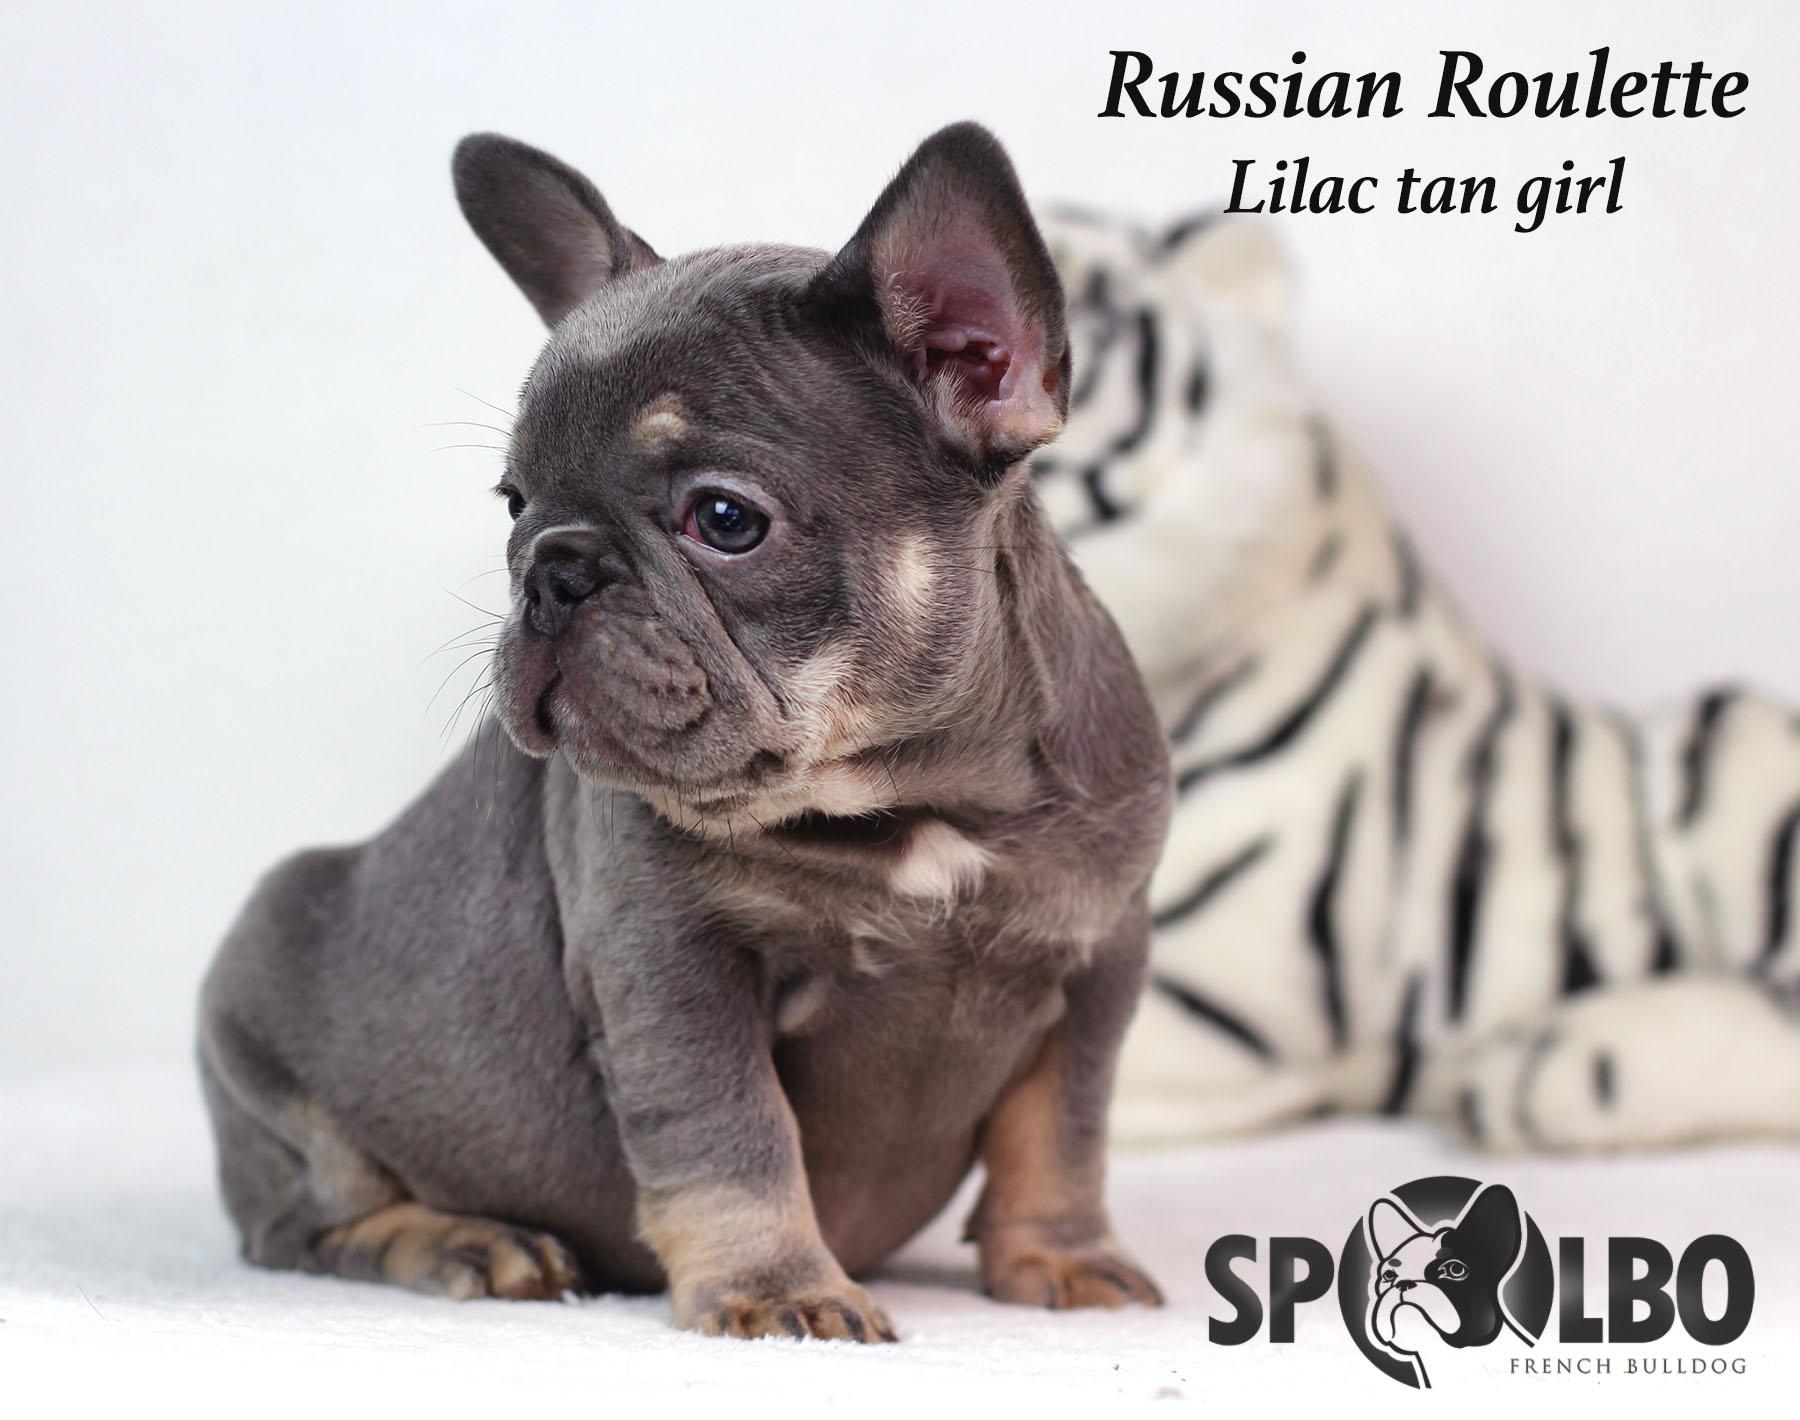 Russian rouletteWM